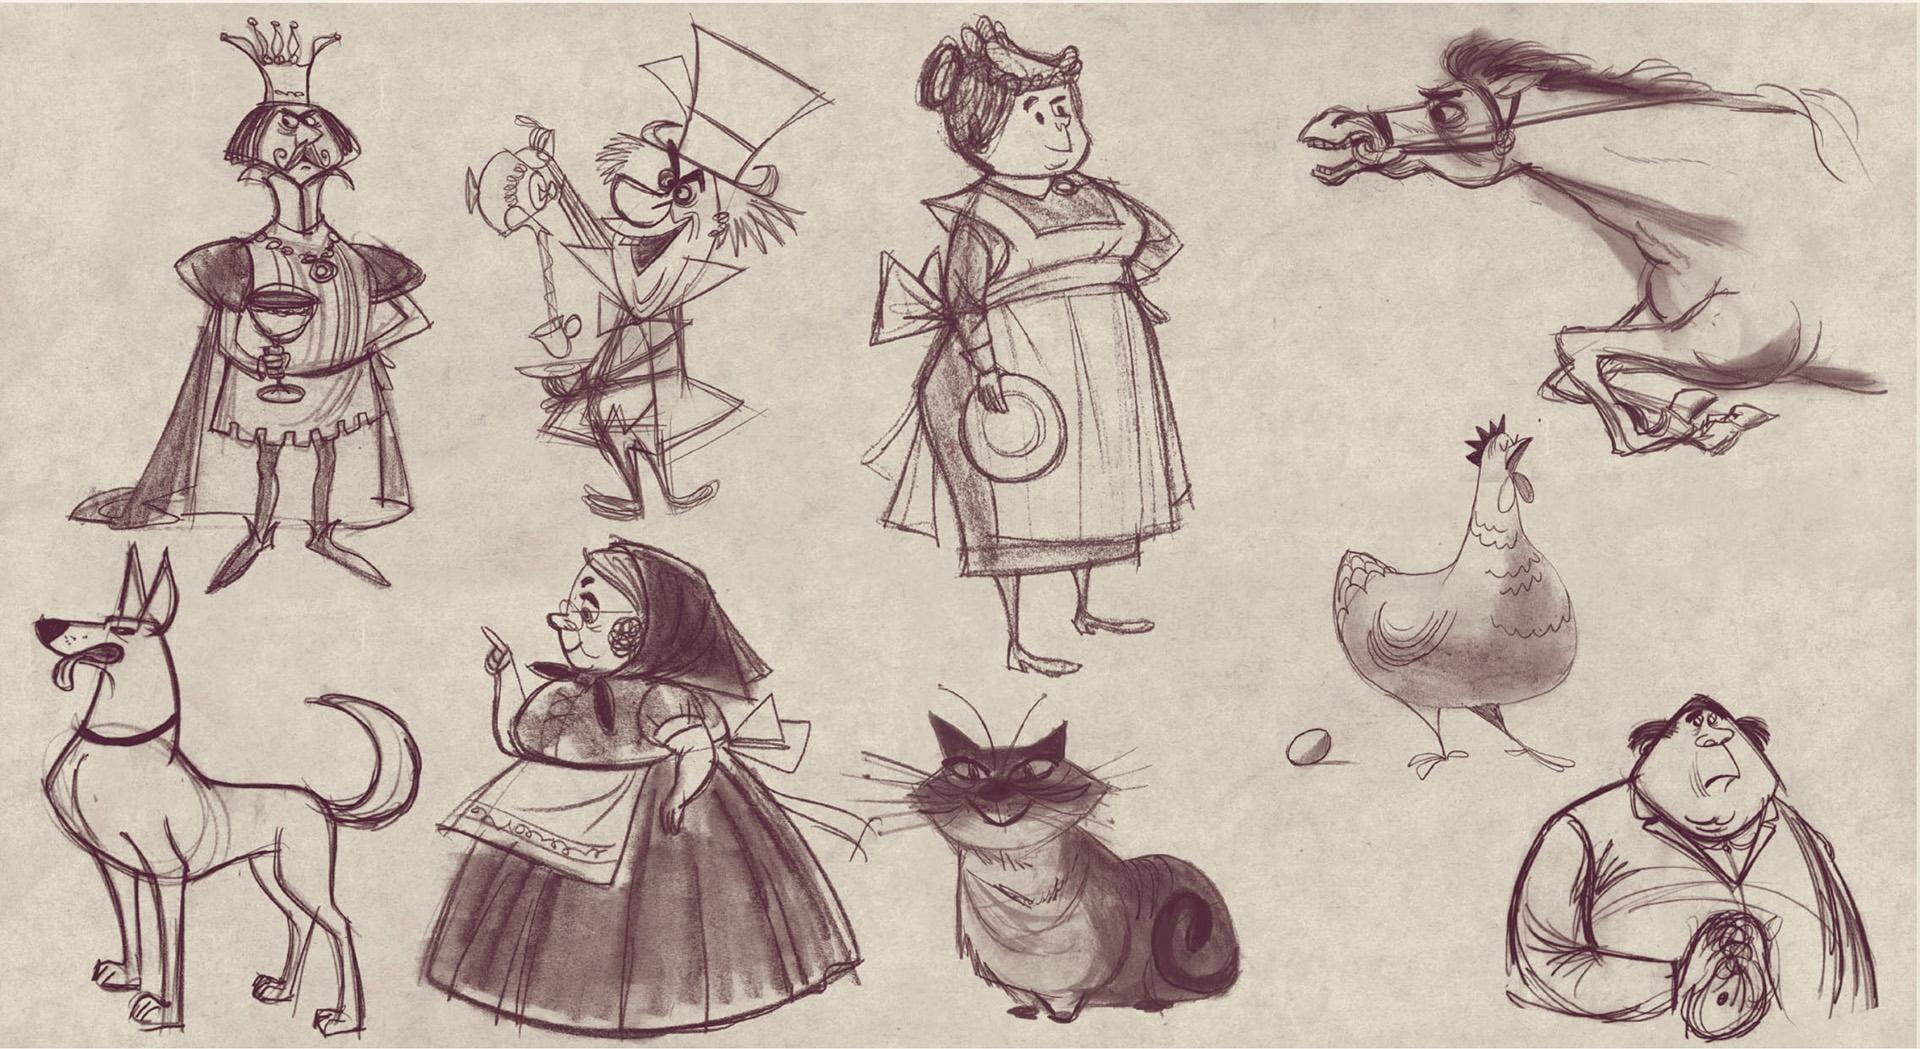 Tom Oreb character designs Walt Disney Studios